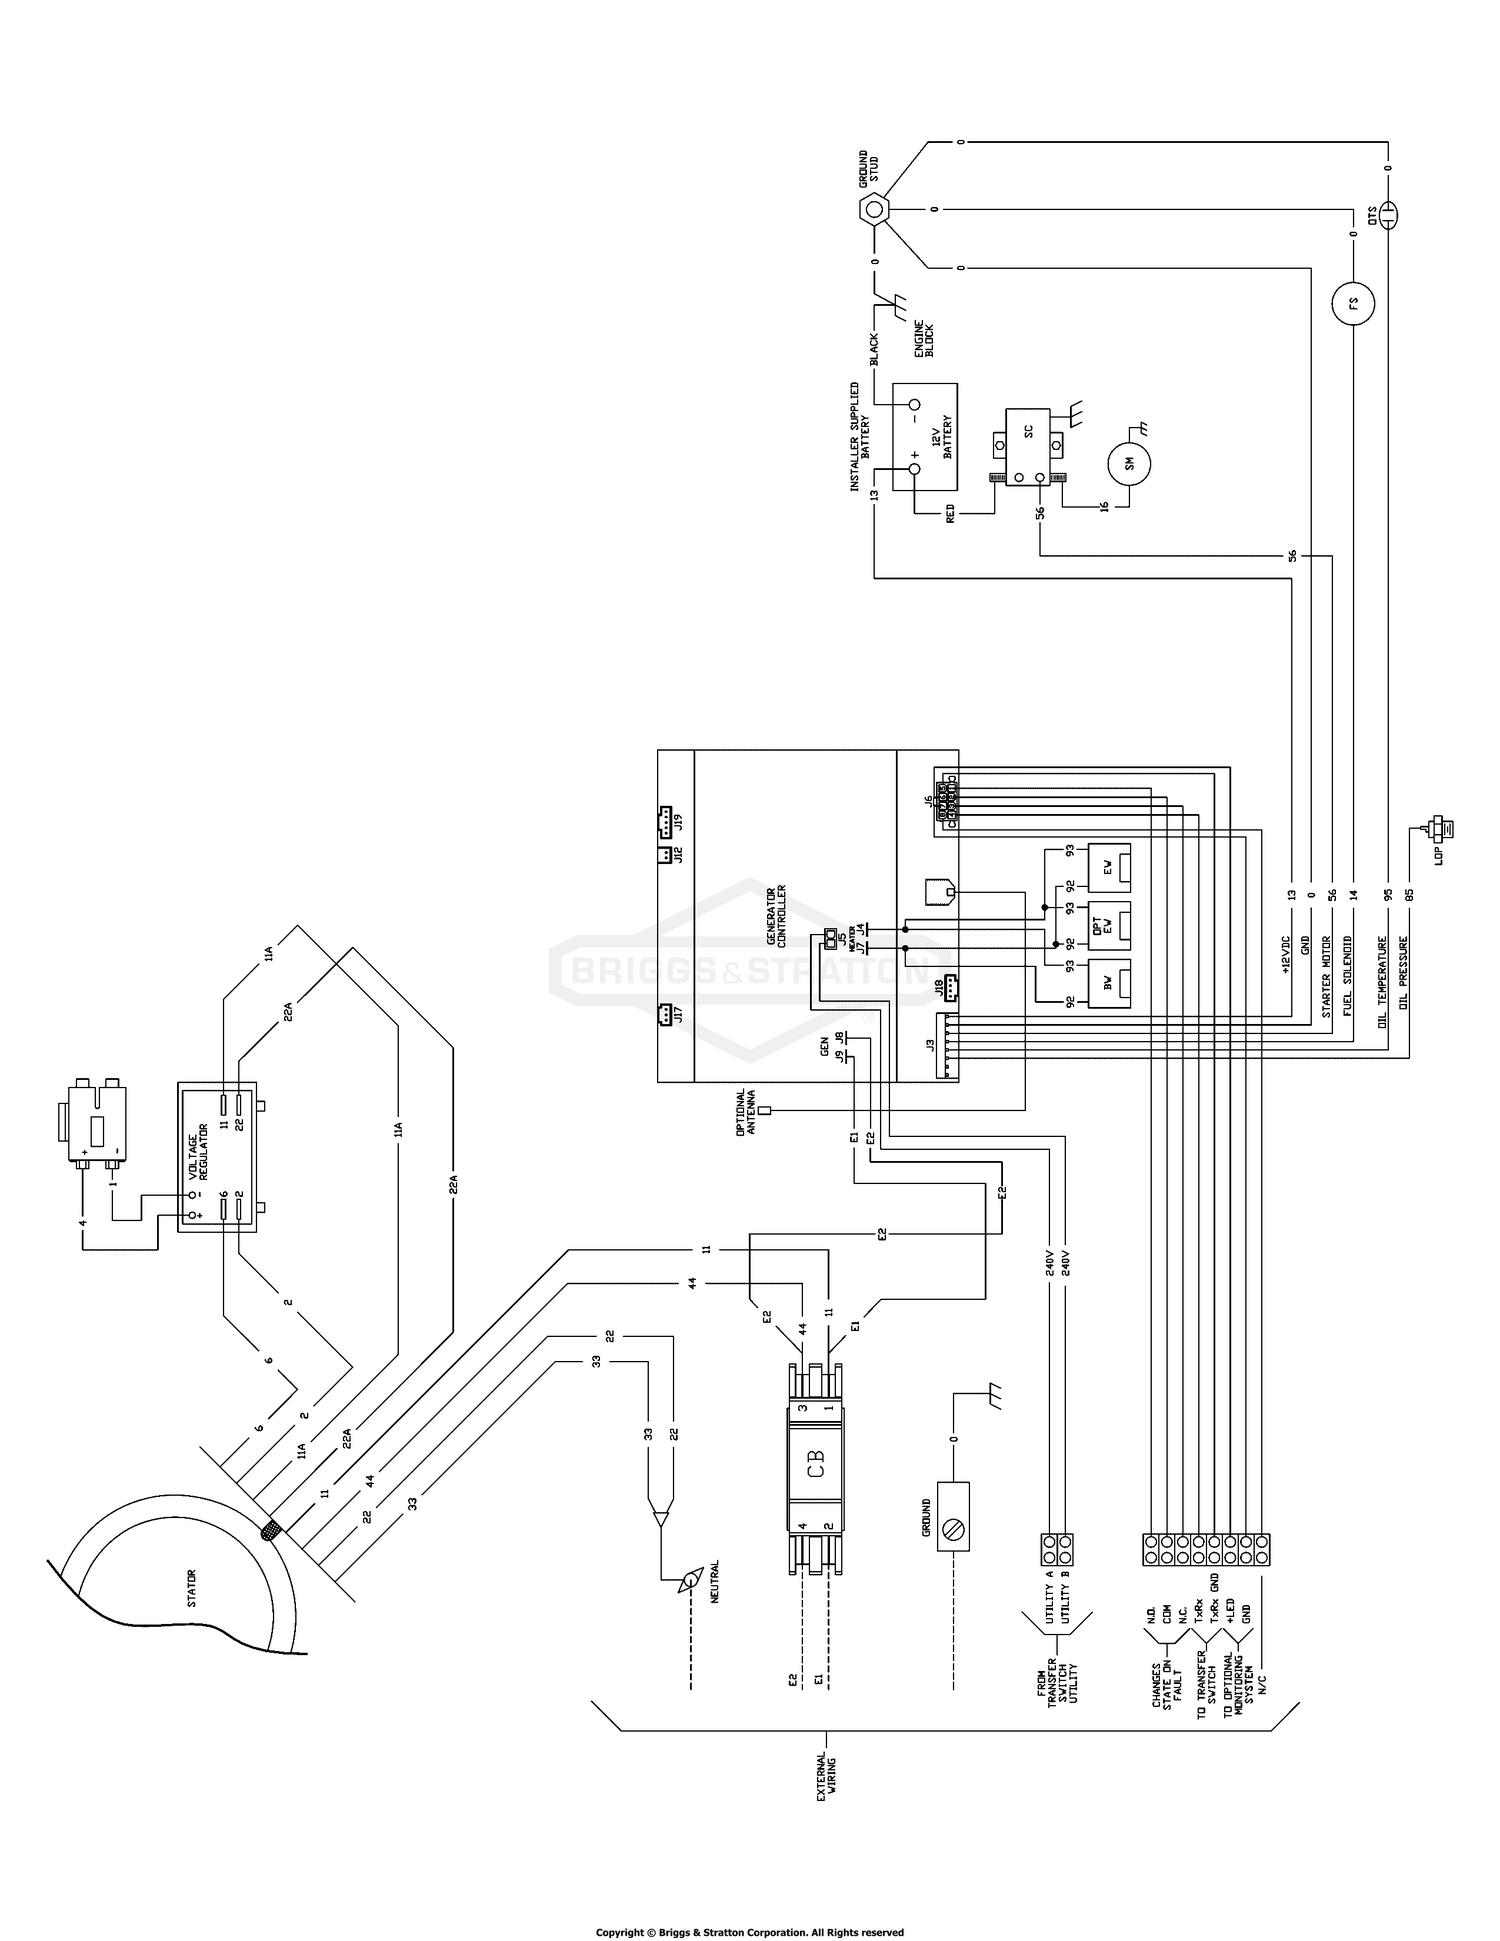 cummins starter wiring diagram lt 2825  briggs and stratton starter wiring diagram wiring diagram  starter wiring diagram wiring diagram